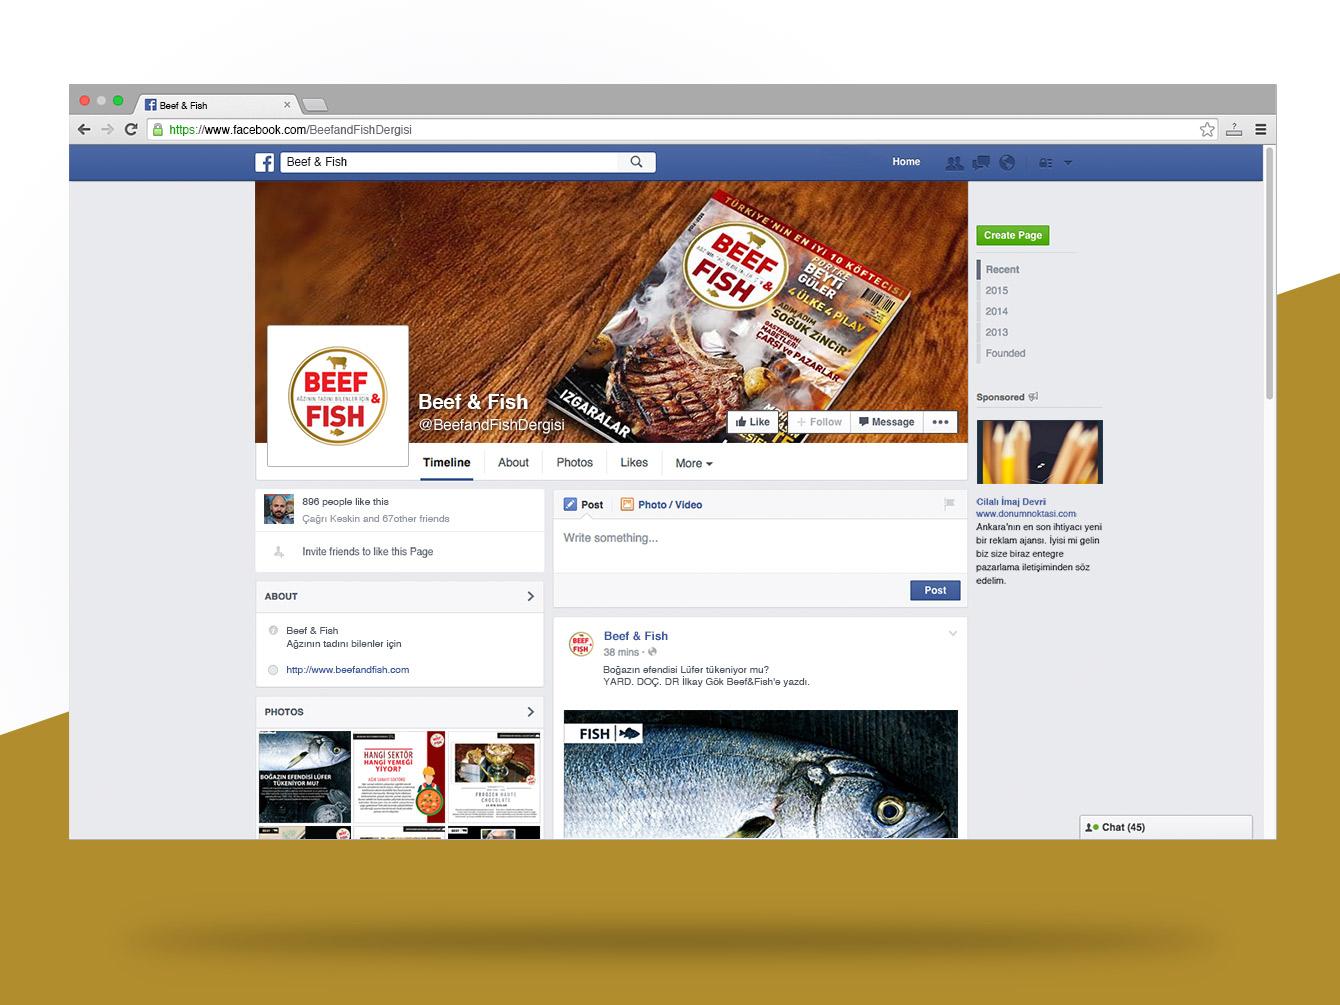 Beef & Fish Facebook